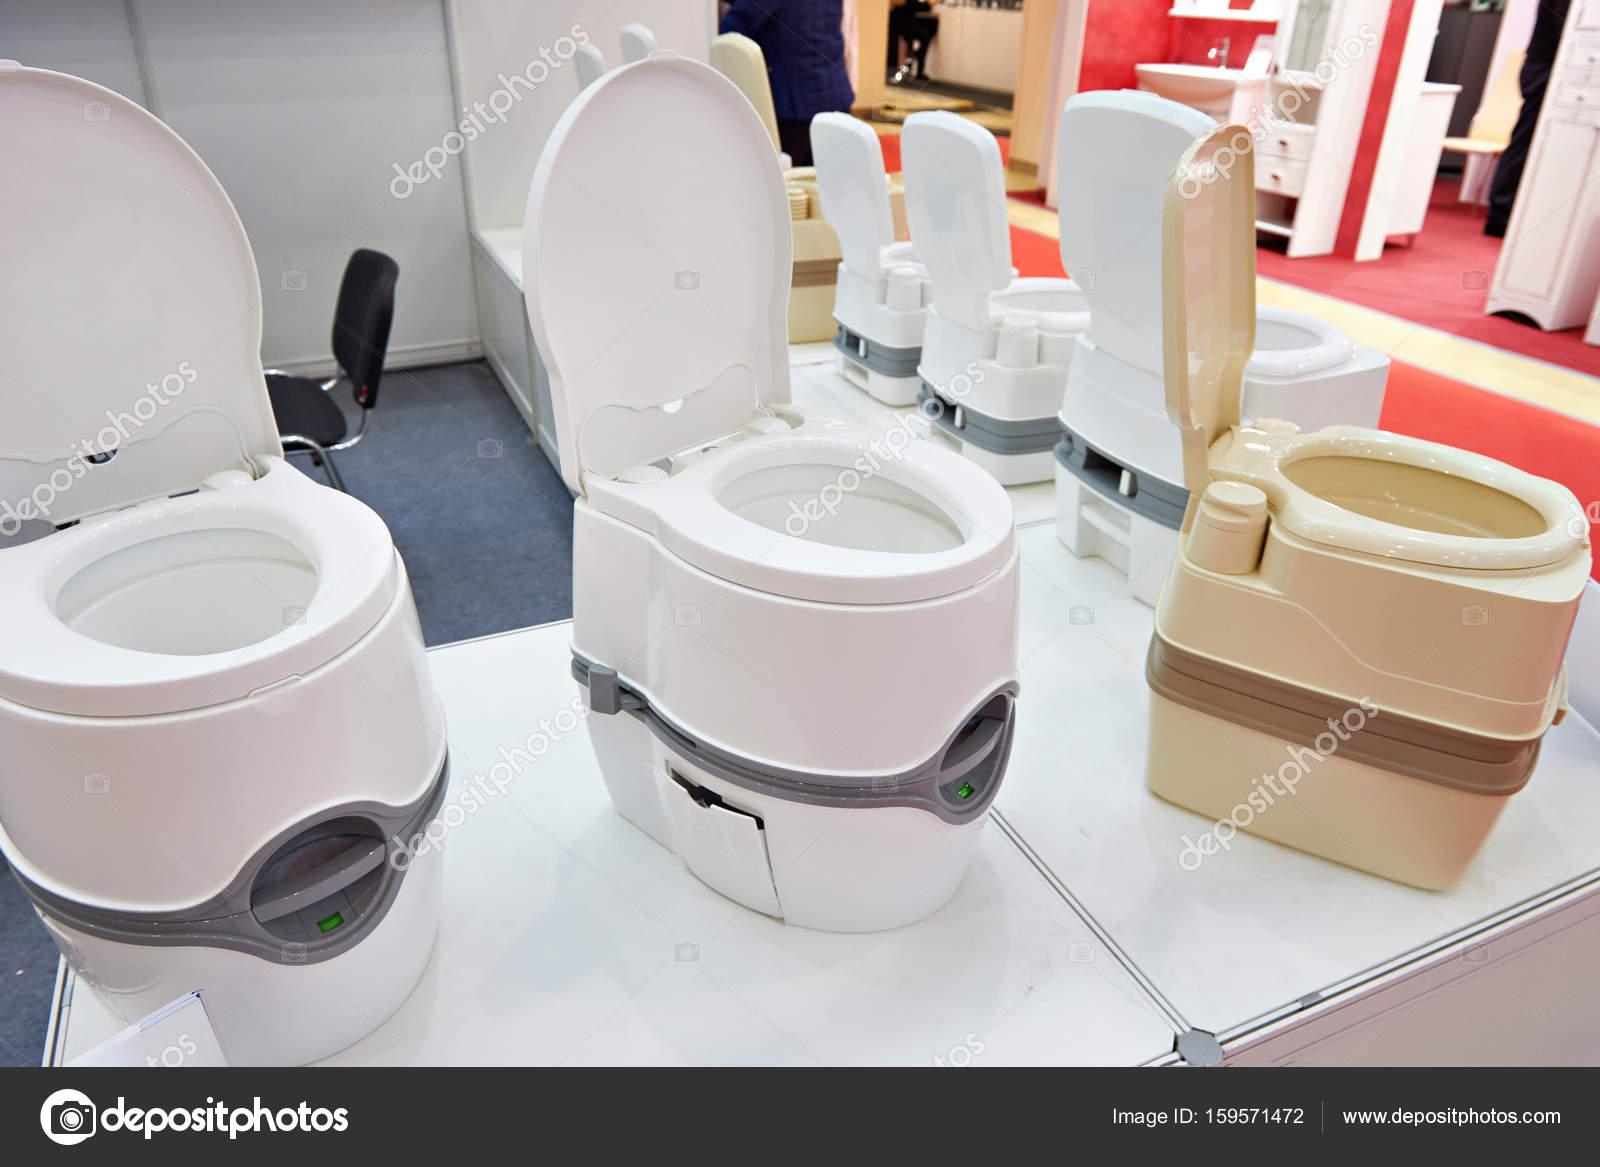 Portable Toilet Exhibition : Portable toilets in shop at exhibition u2014 stock photo © ryzhov #159571472